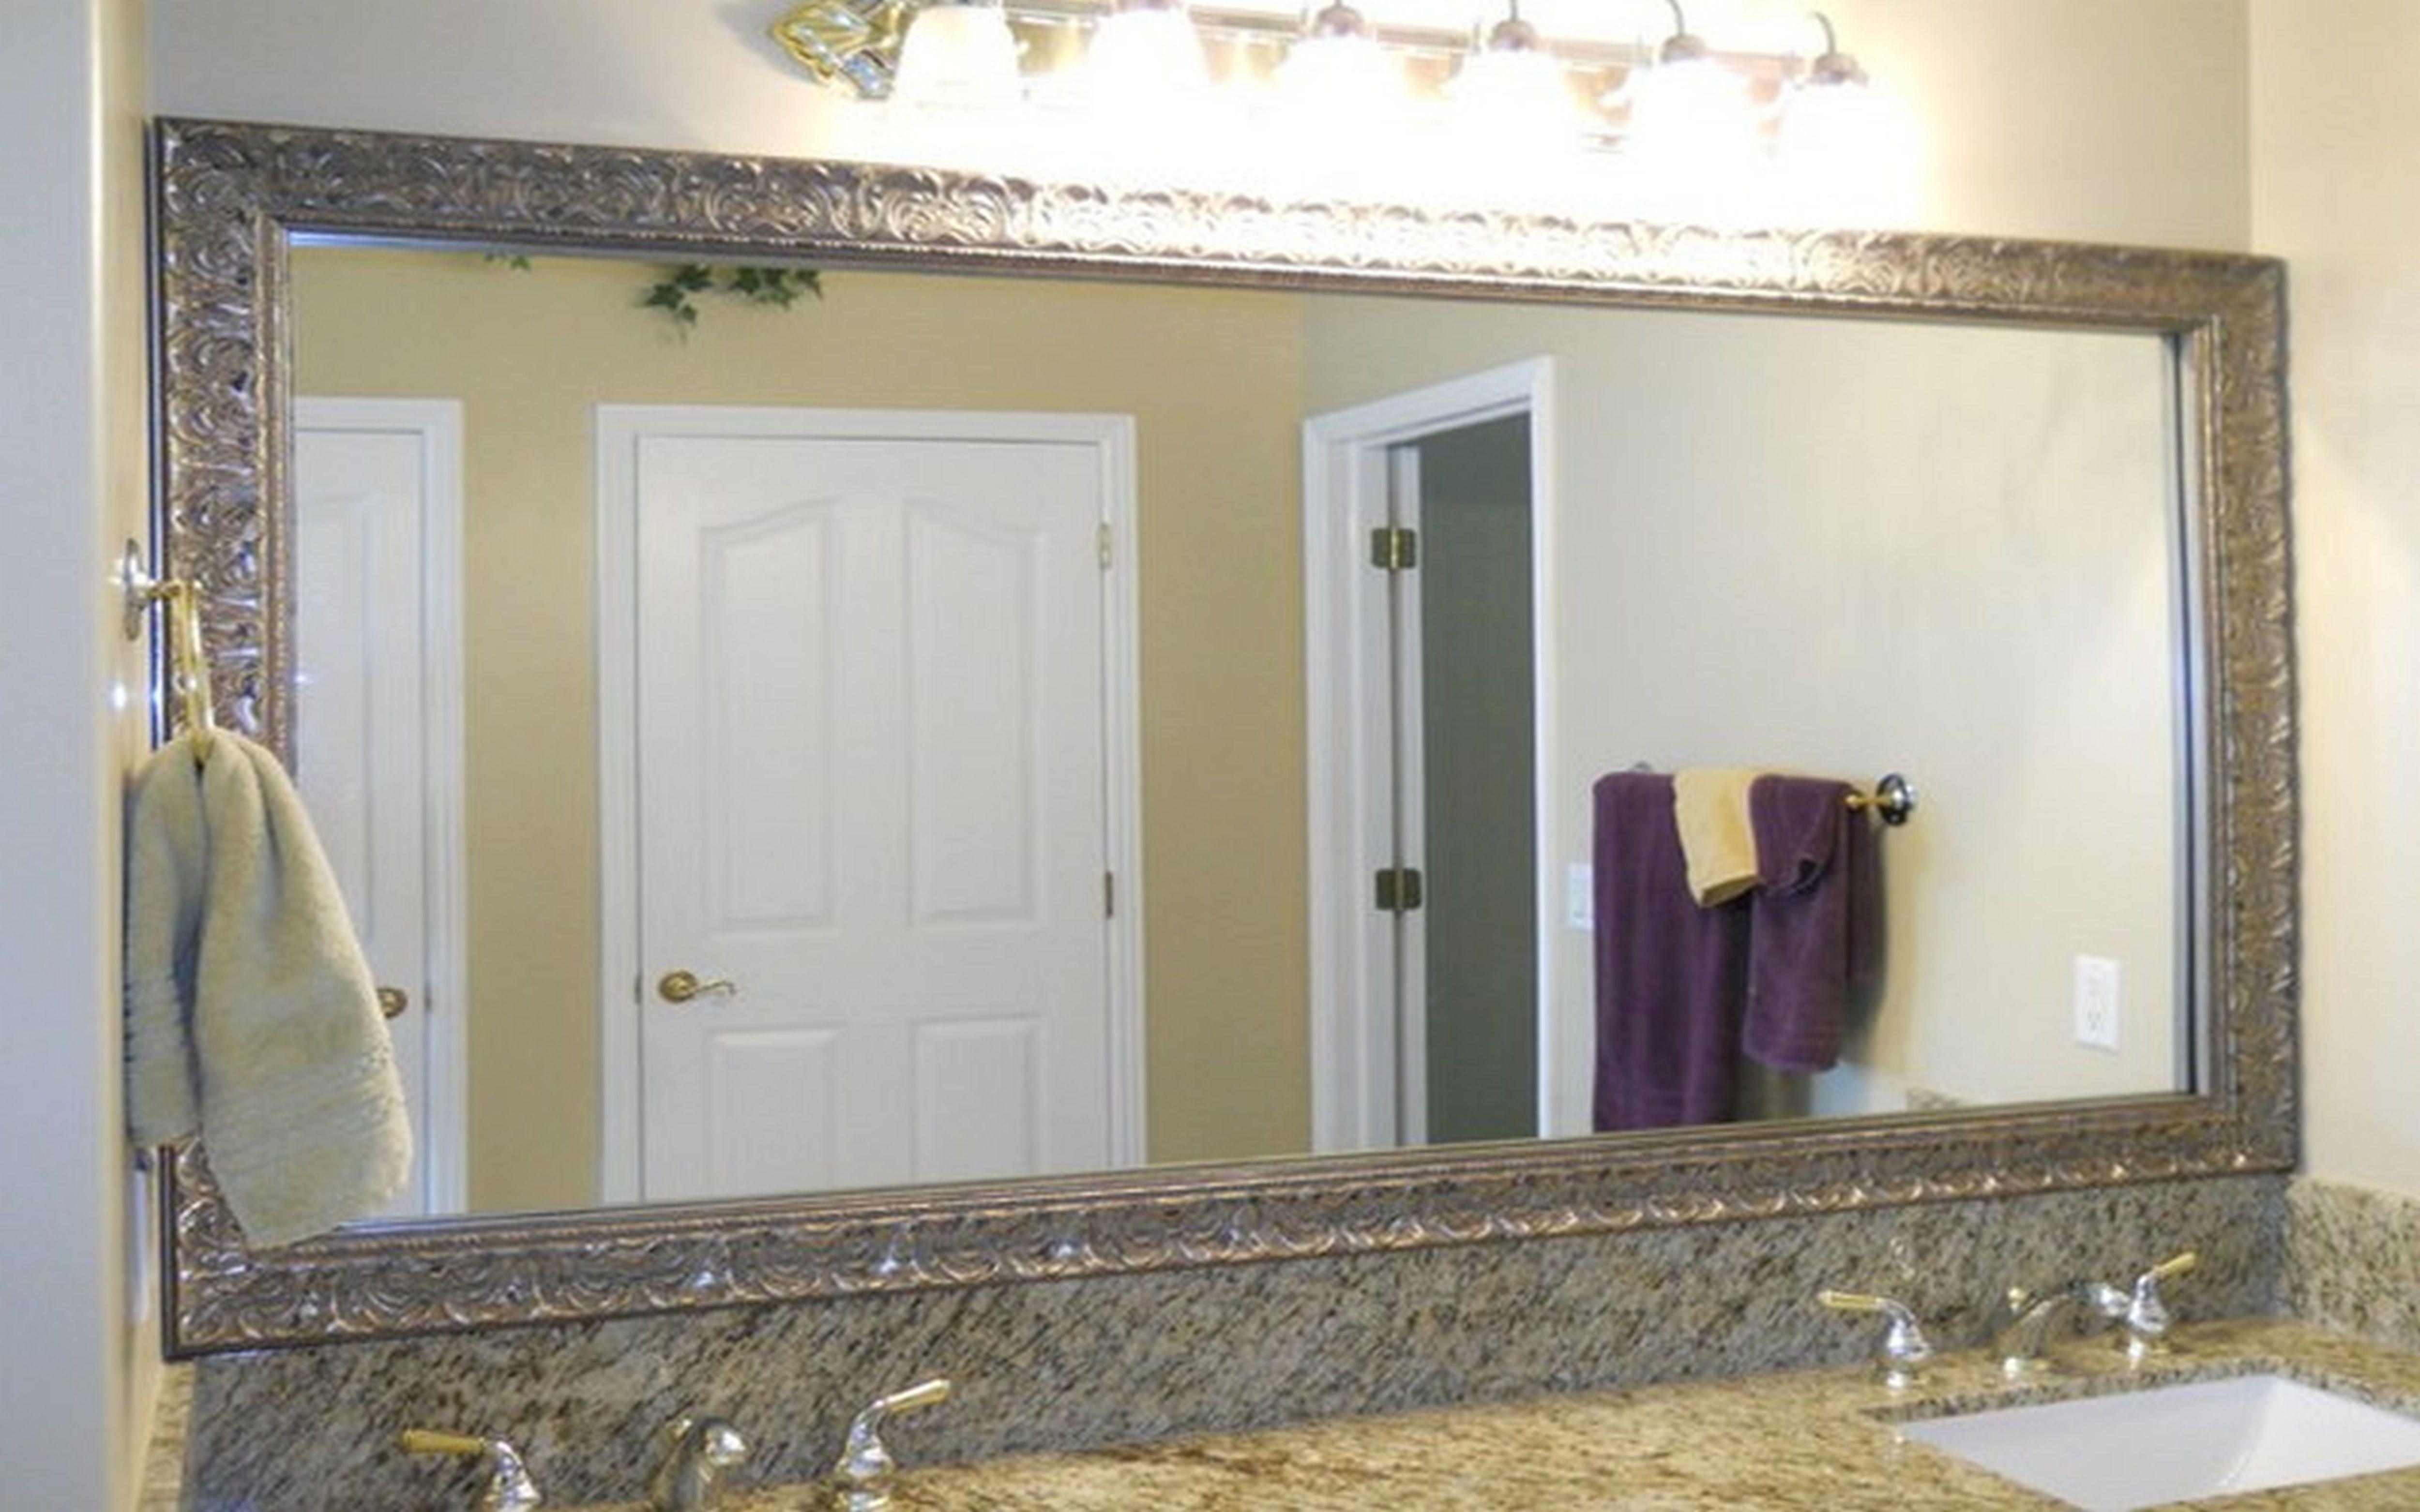 Bathroom: Elegant Bathroom Decor With Large Framed Bathroom For Extra Large Venetian Mirror (Image 1 of 20)